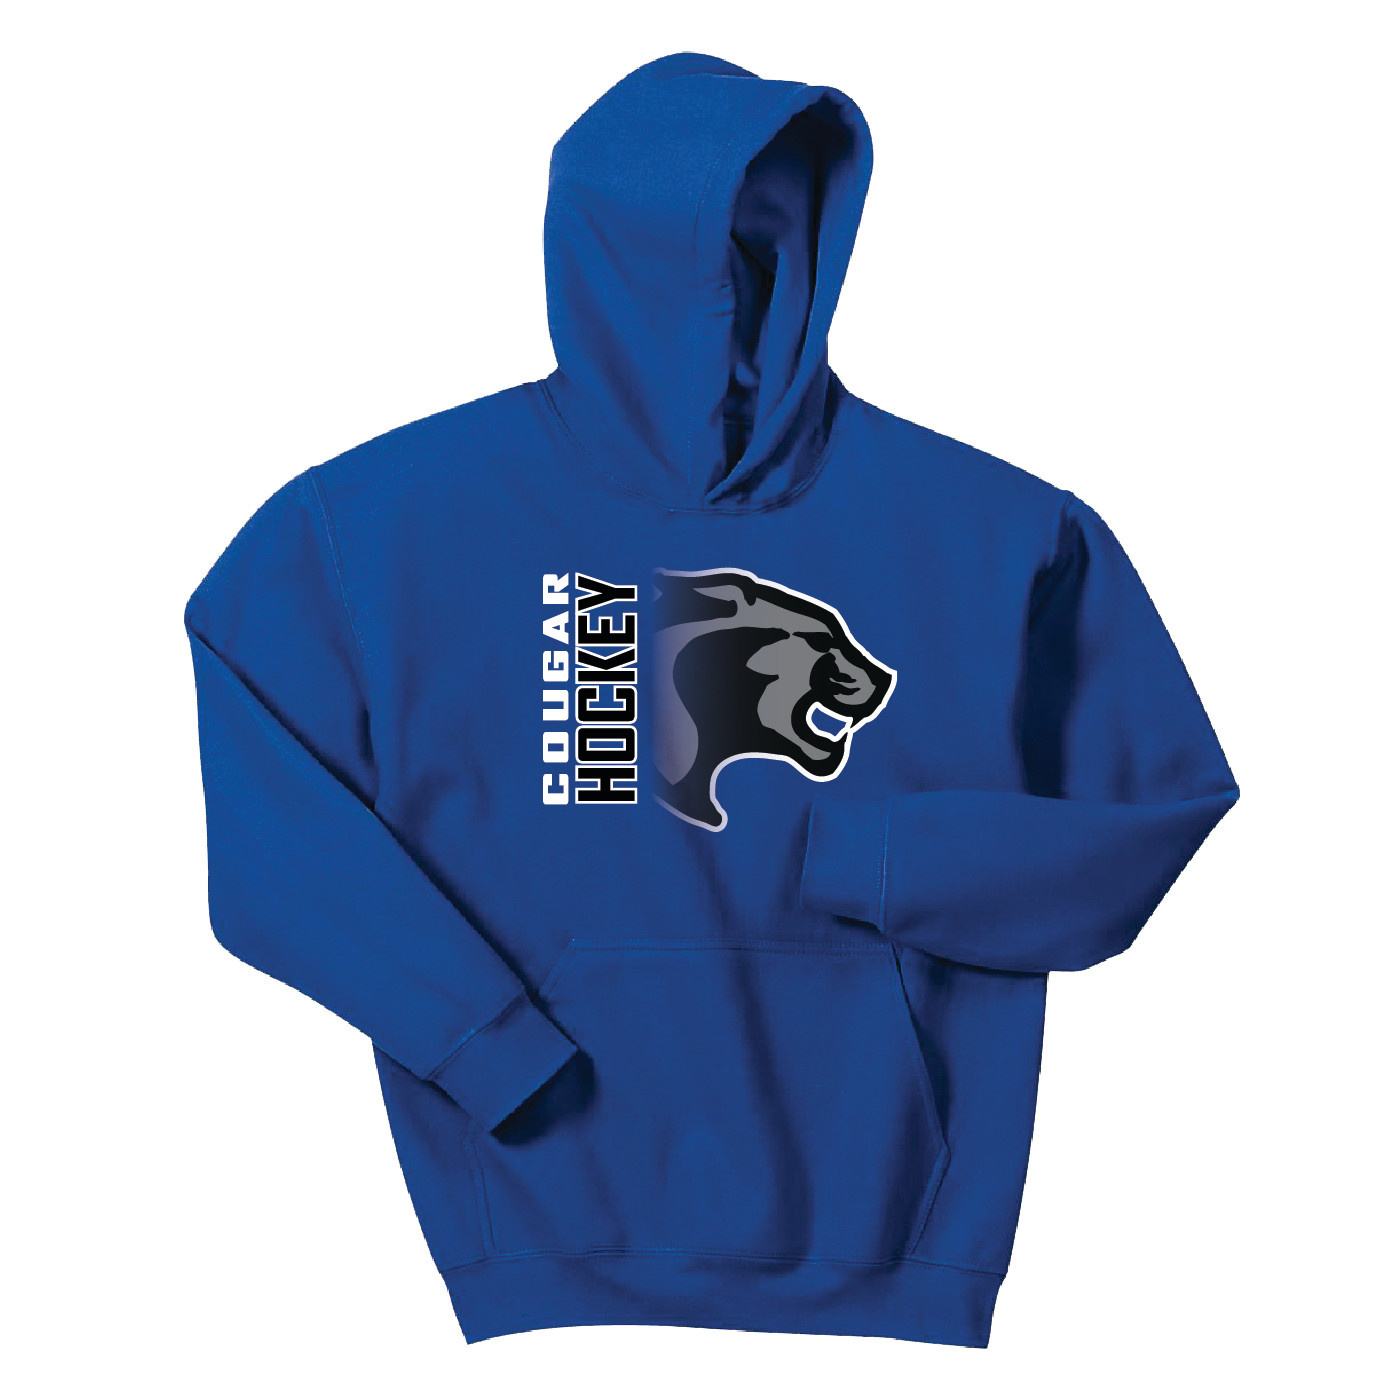 Gildan Gildan Youth Heavy Blend Hooded Sweatshirt (Royal)